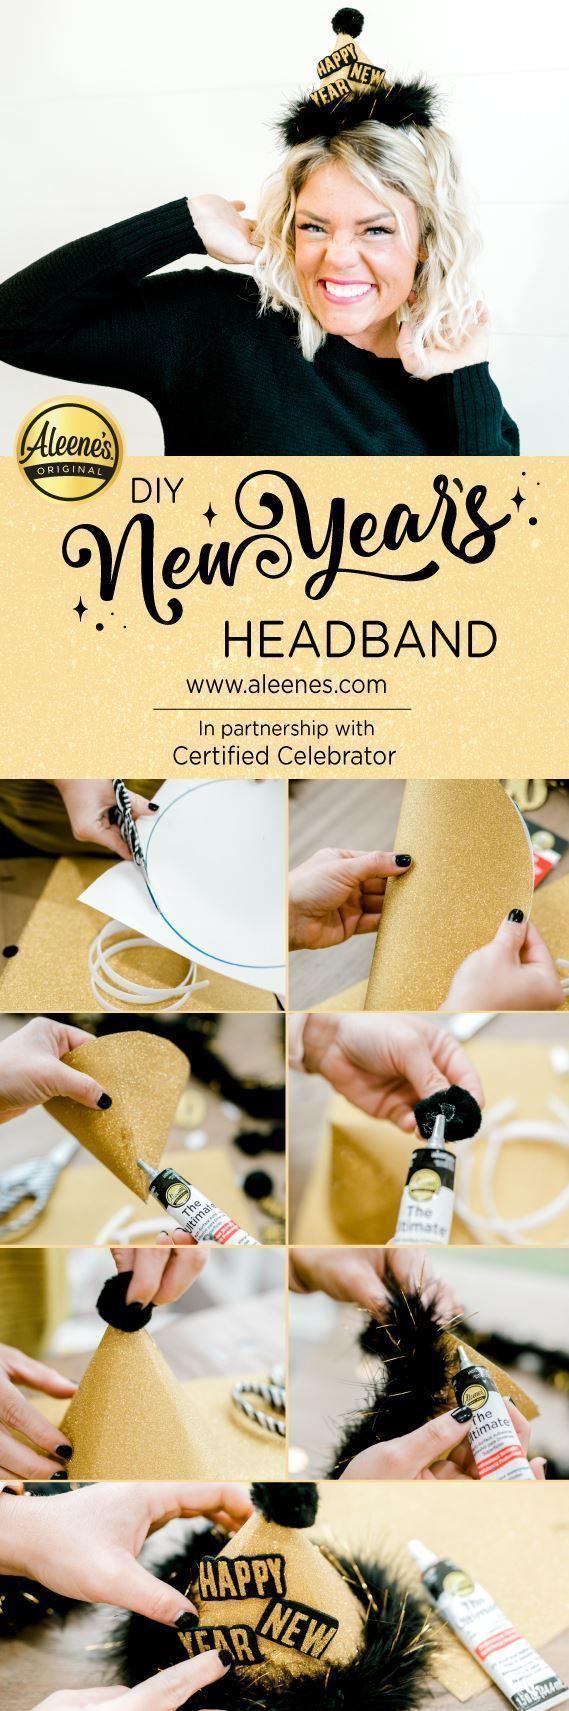 Aleene's DIY New Year's Headbands